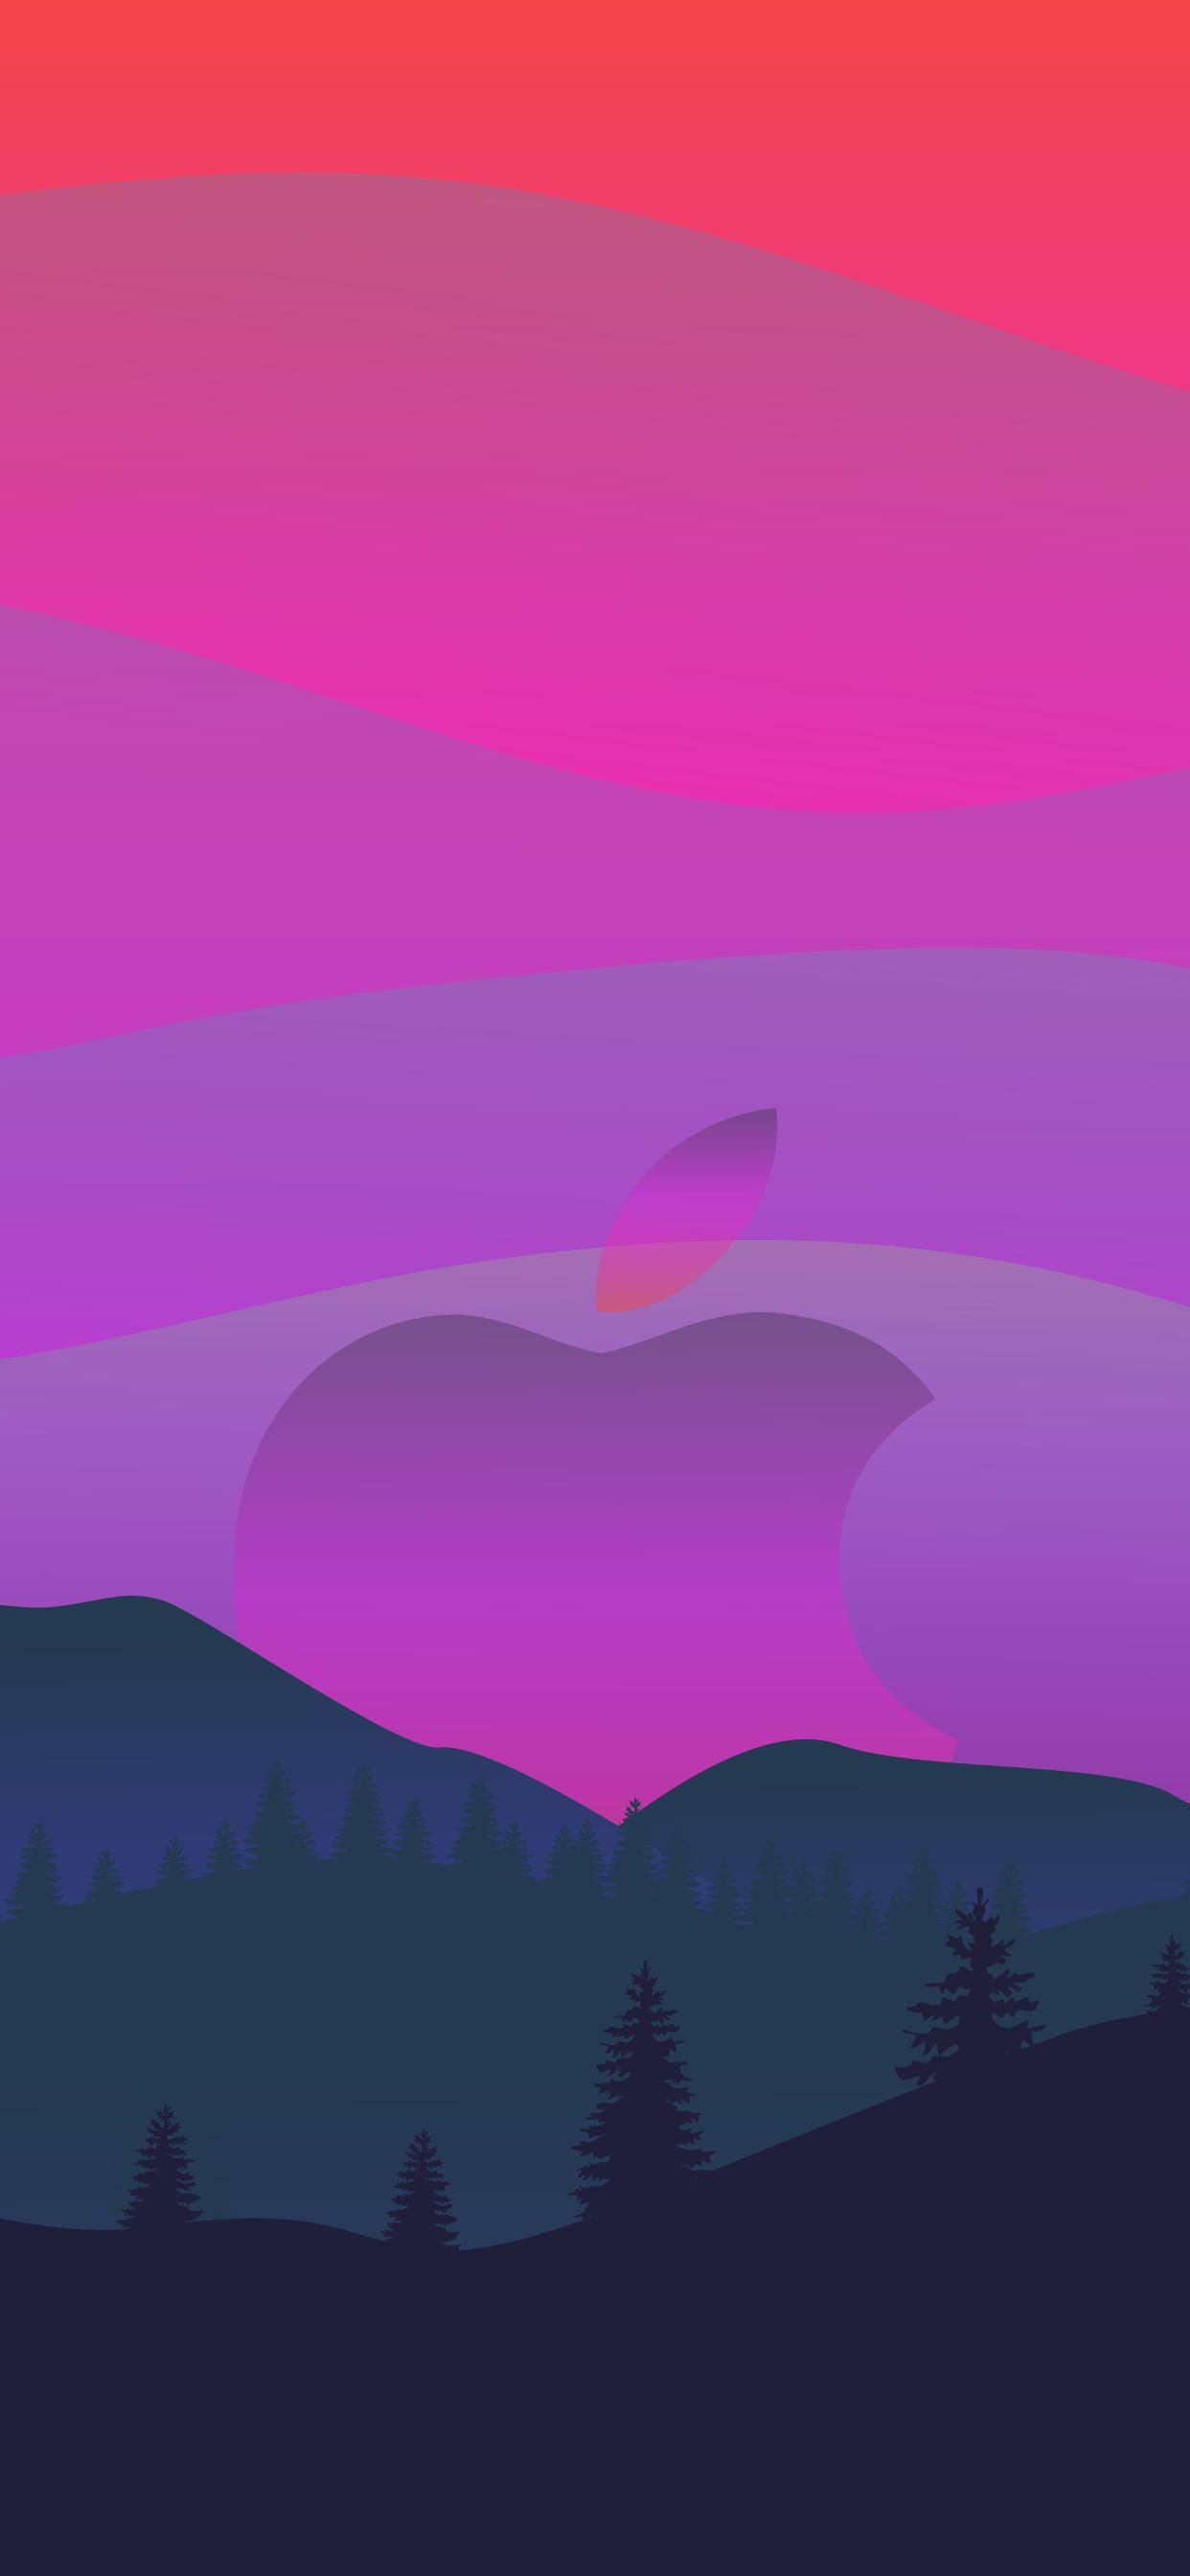 Apple logo background wallpaper aesthetic hd